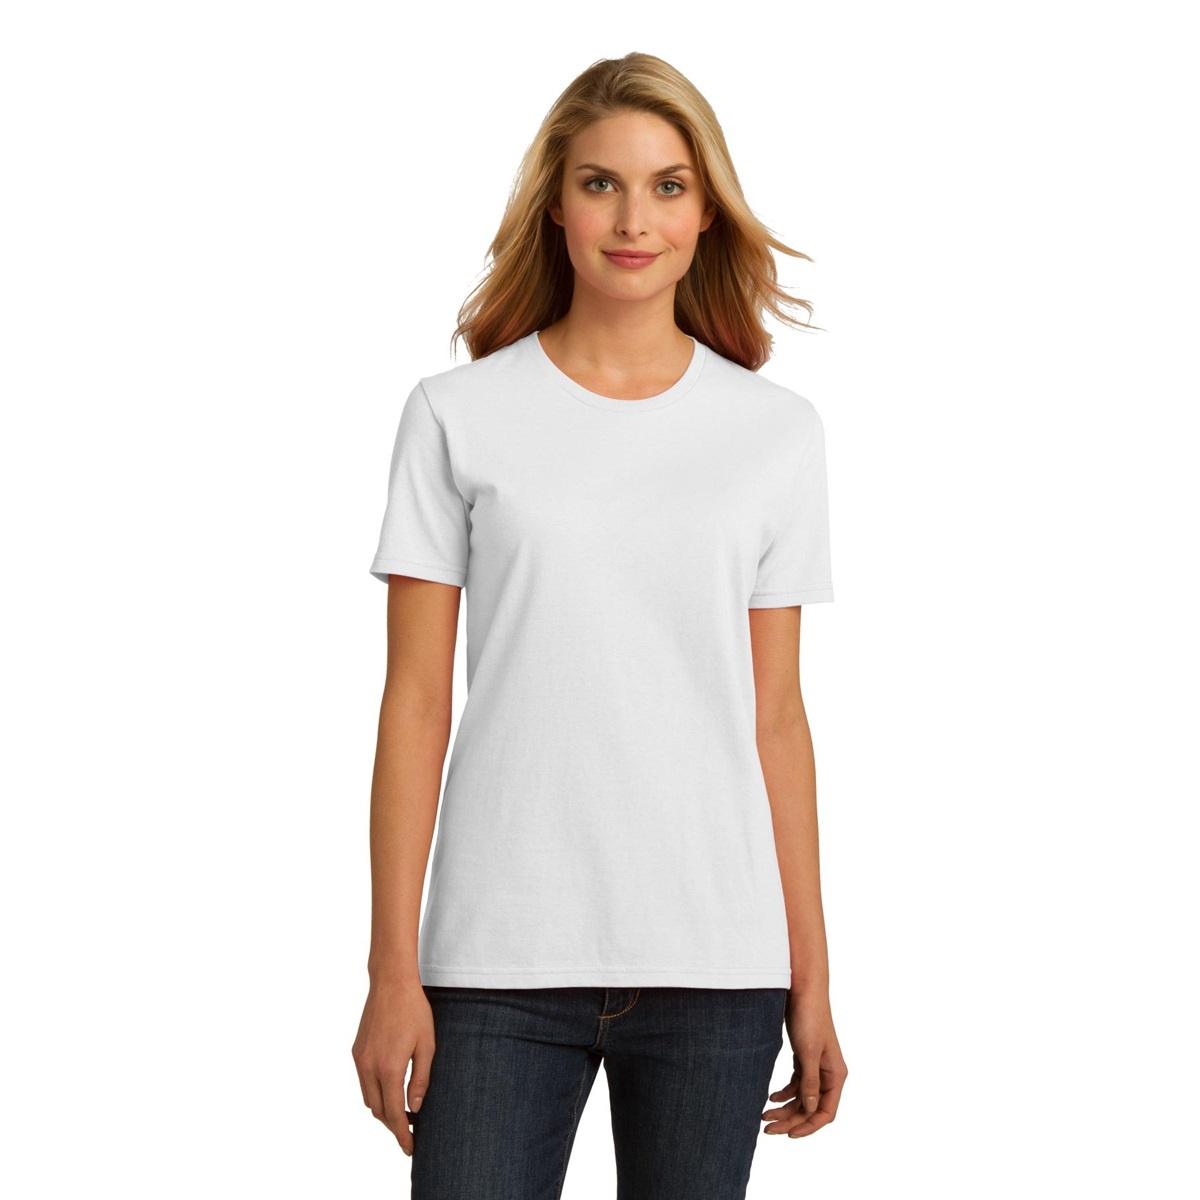 Port company lpc150org ladies essential 100 organic for 100 ringspun cotton t shirt wholesale